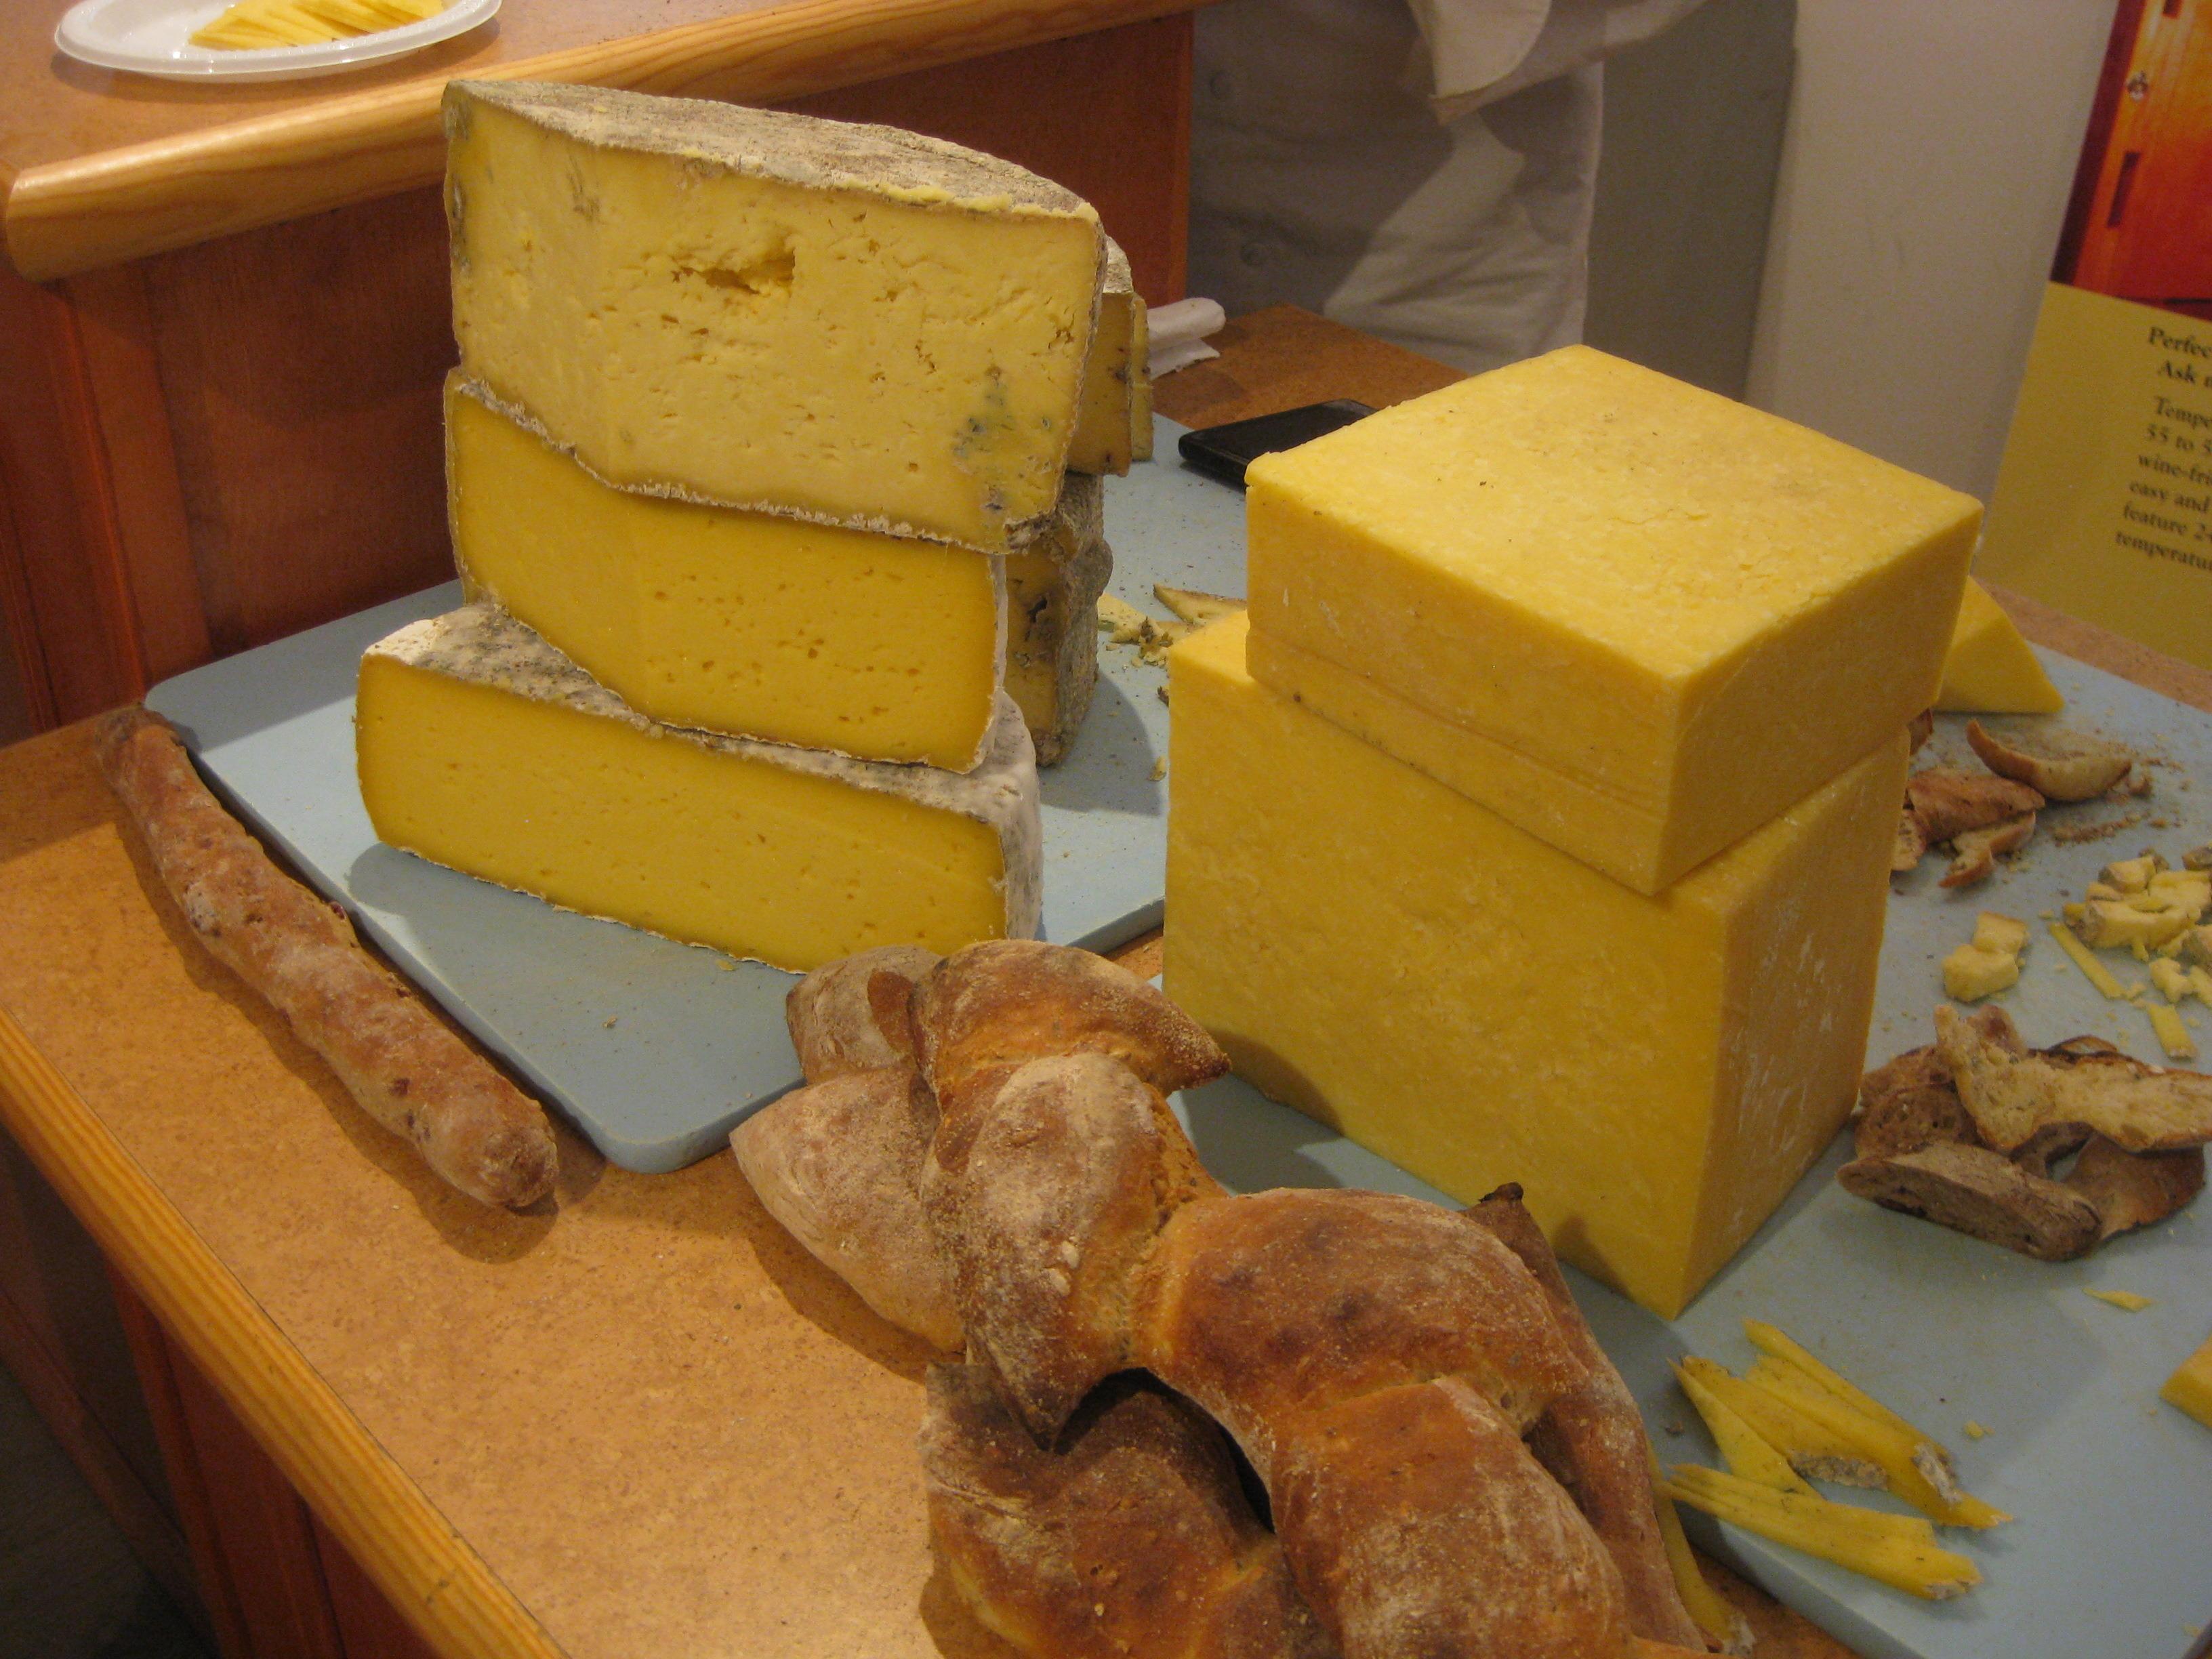 ee3ca6dbce1694d1a151_cheese2.jpg